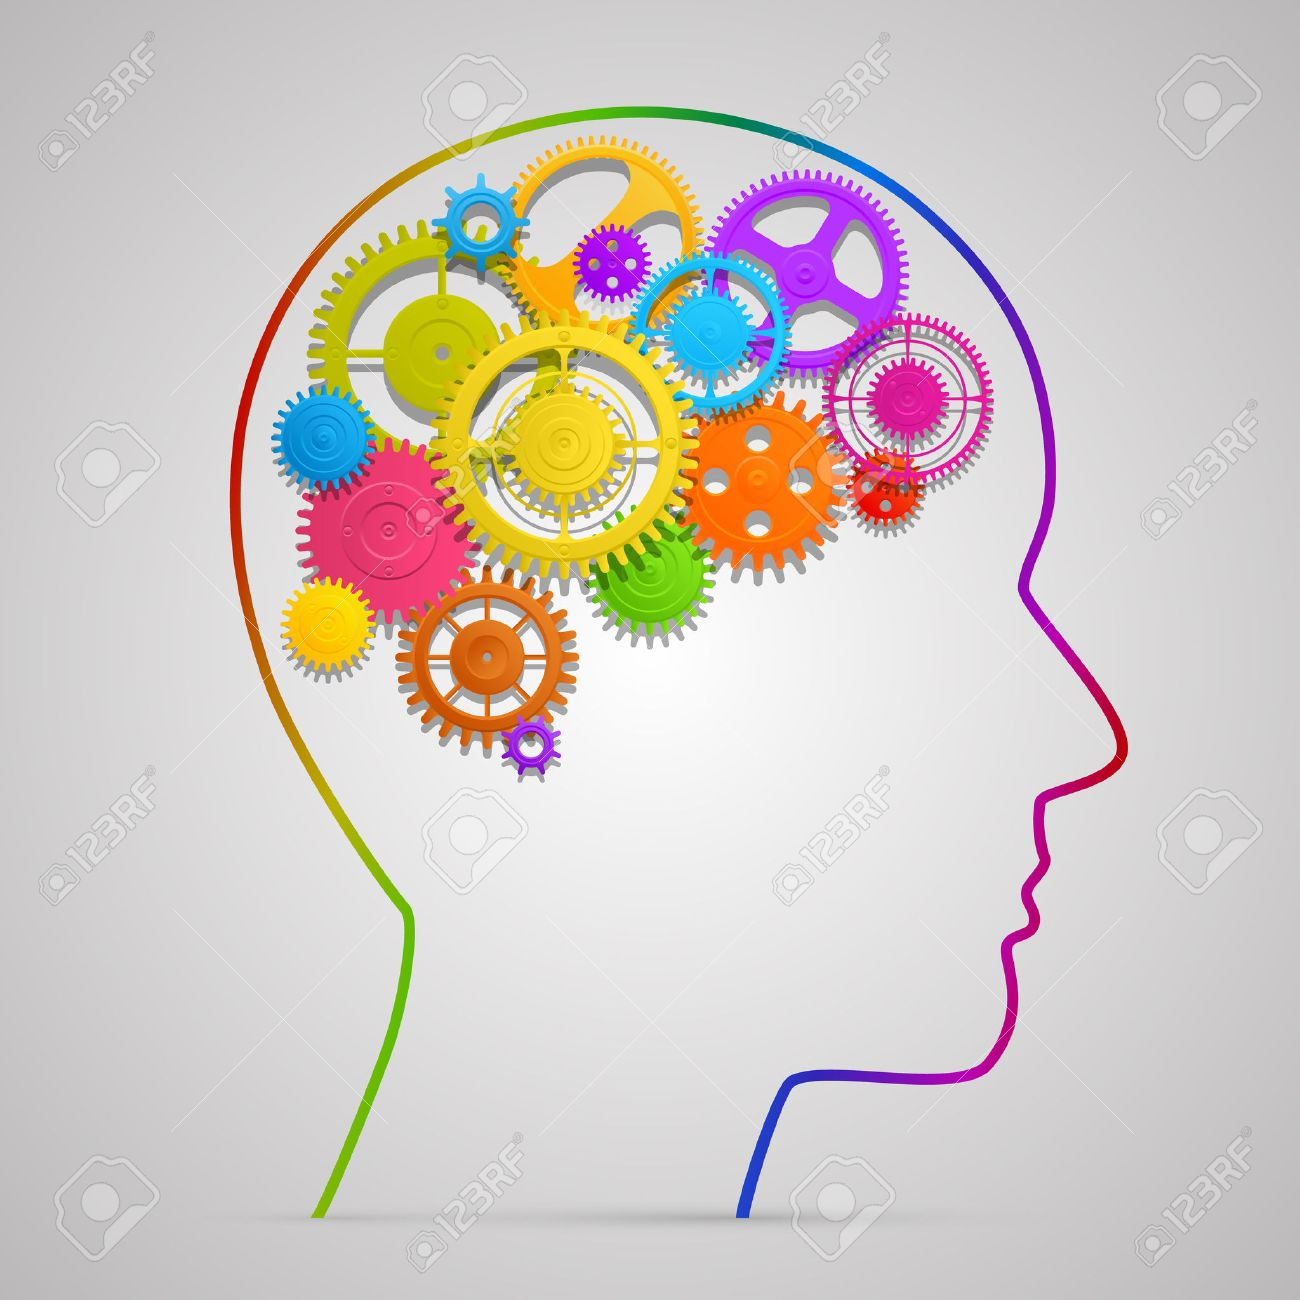 Head with gears in brain art. Vector illustration - 36275983